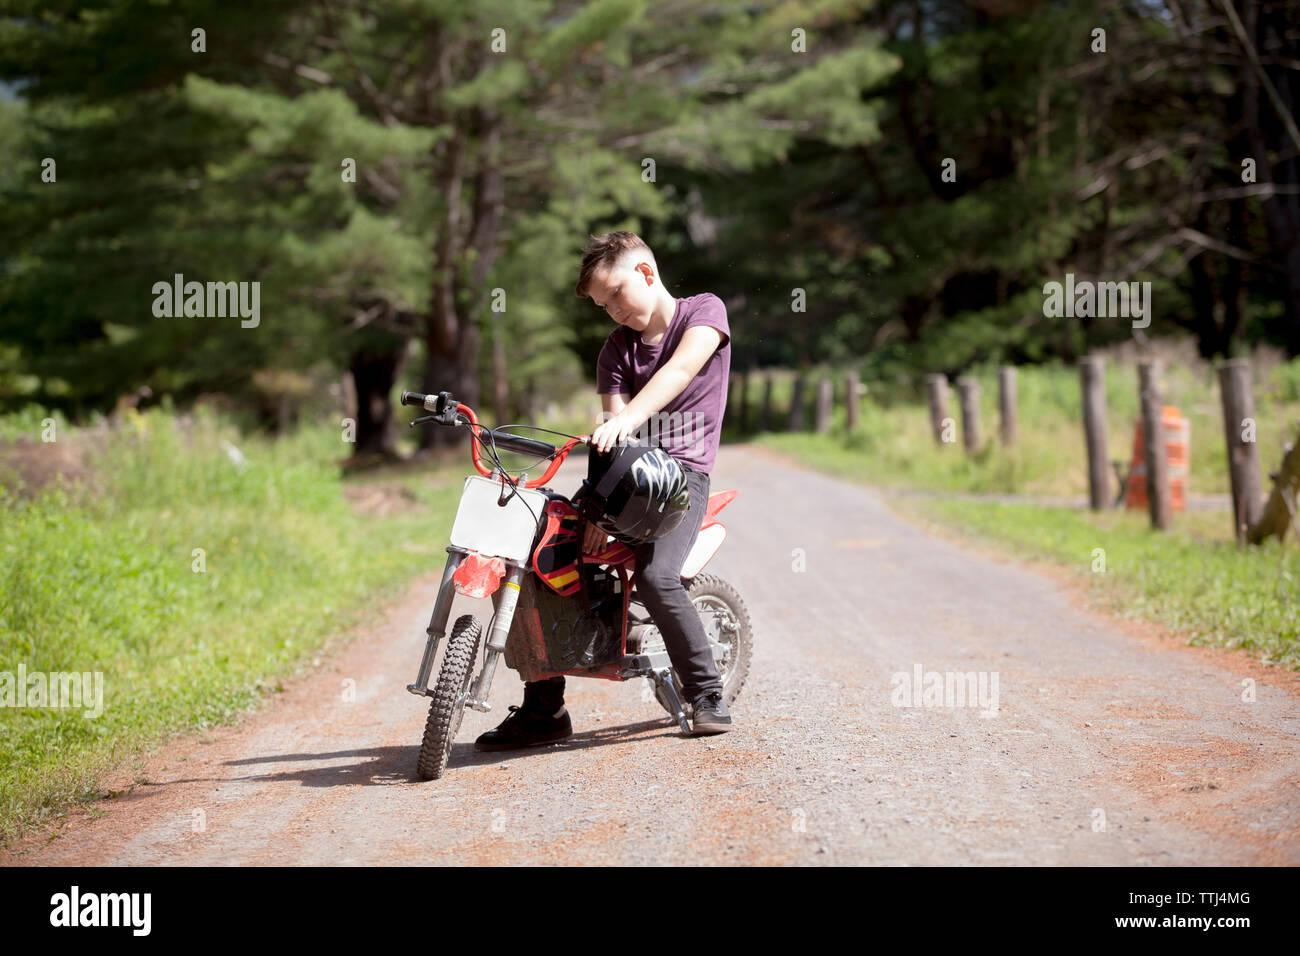 Boy holding crash helmet while sitting on dirt bike - Stock Image